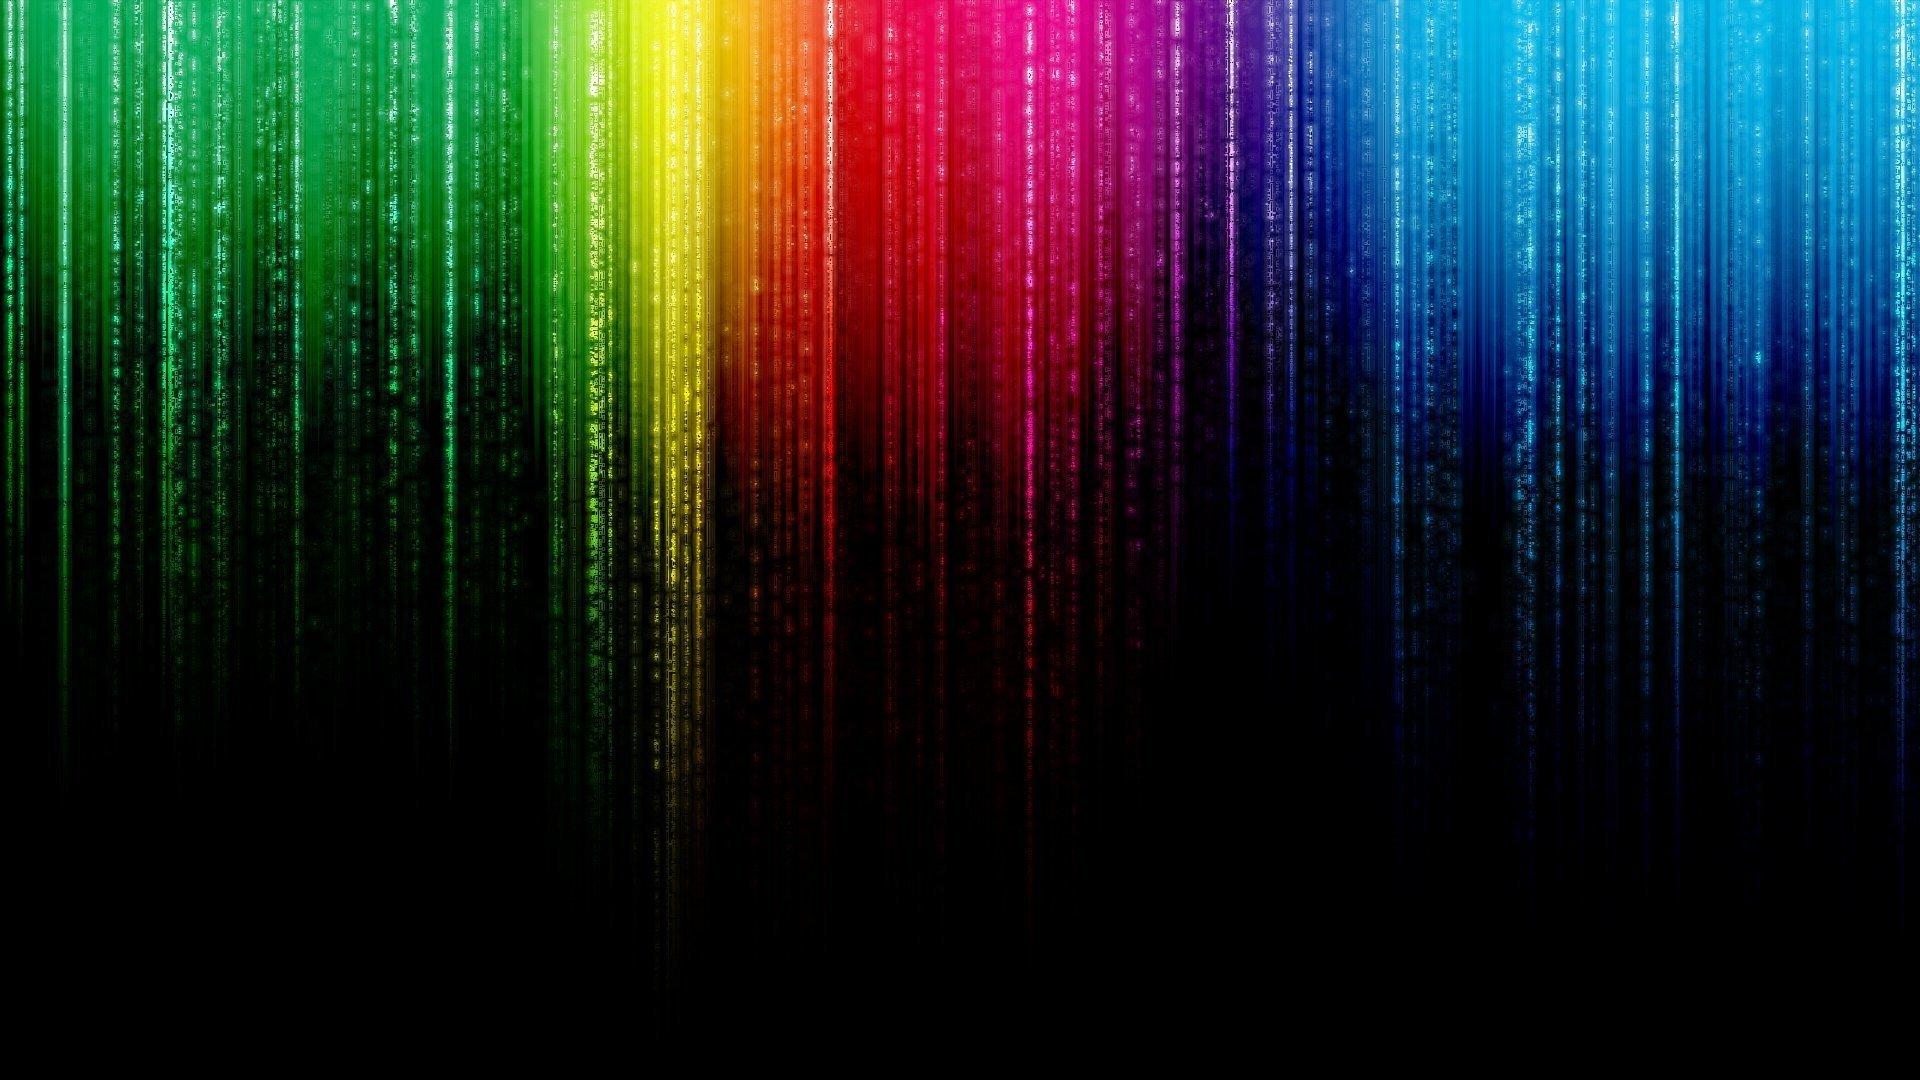 Matrix Wallpaper Free Download